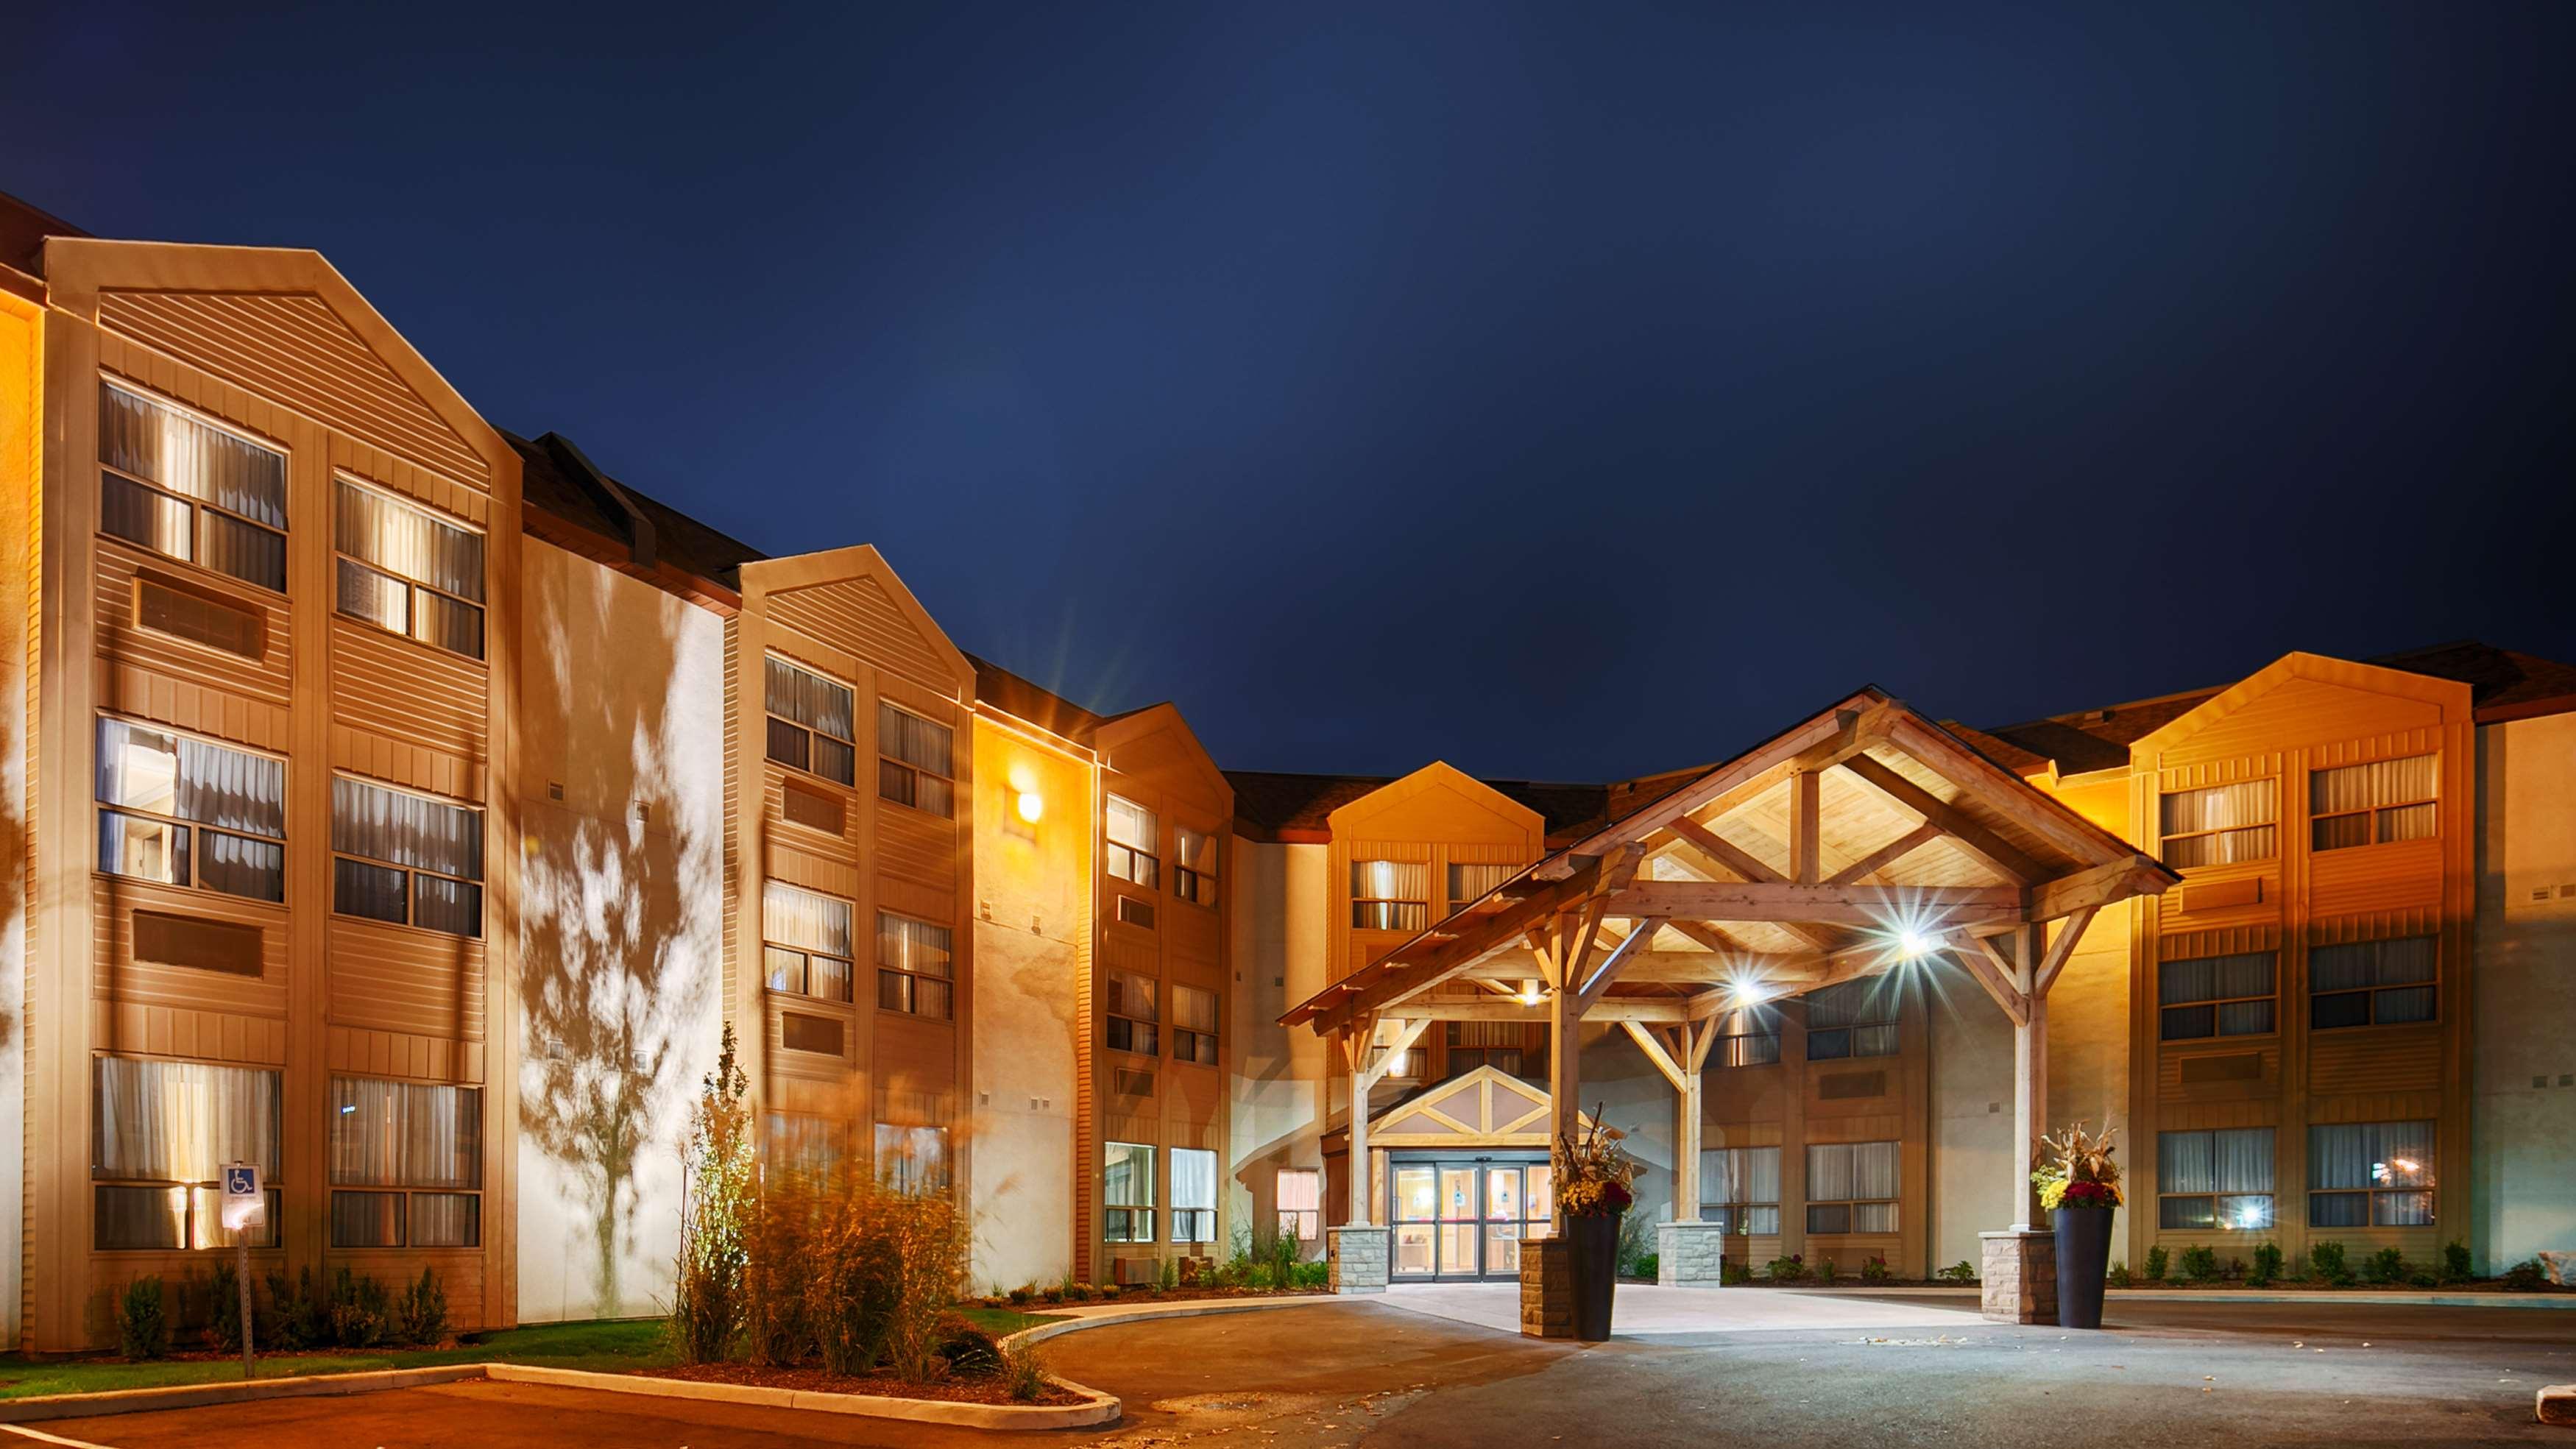 Best Western Plus Rose City Suites in Welland: BEST WESTERN PLUS Rose City Suites